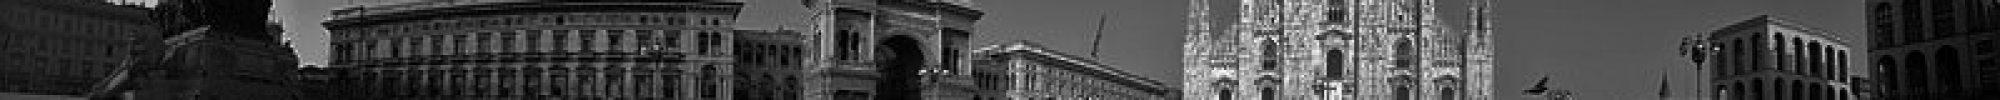 Panorama_of_Duomo_di_Milano_(Milano_2014)_(13218530595)_(2)3